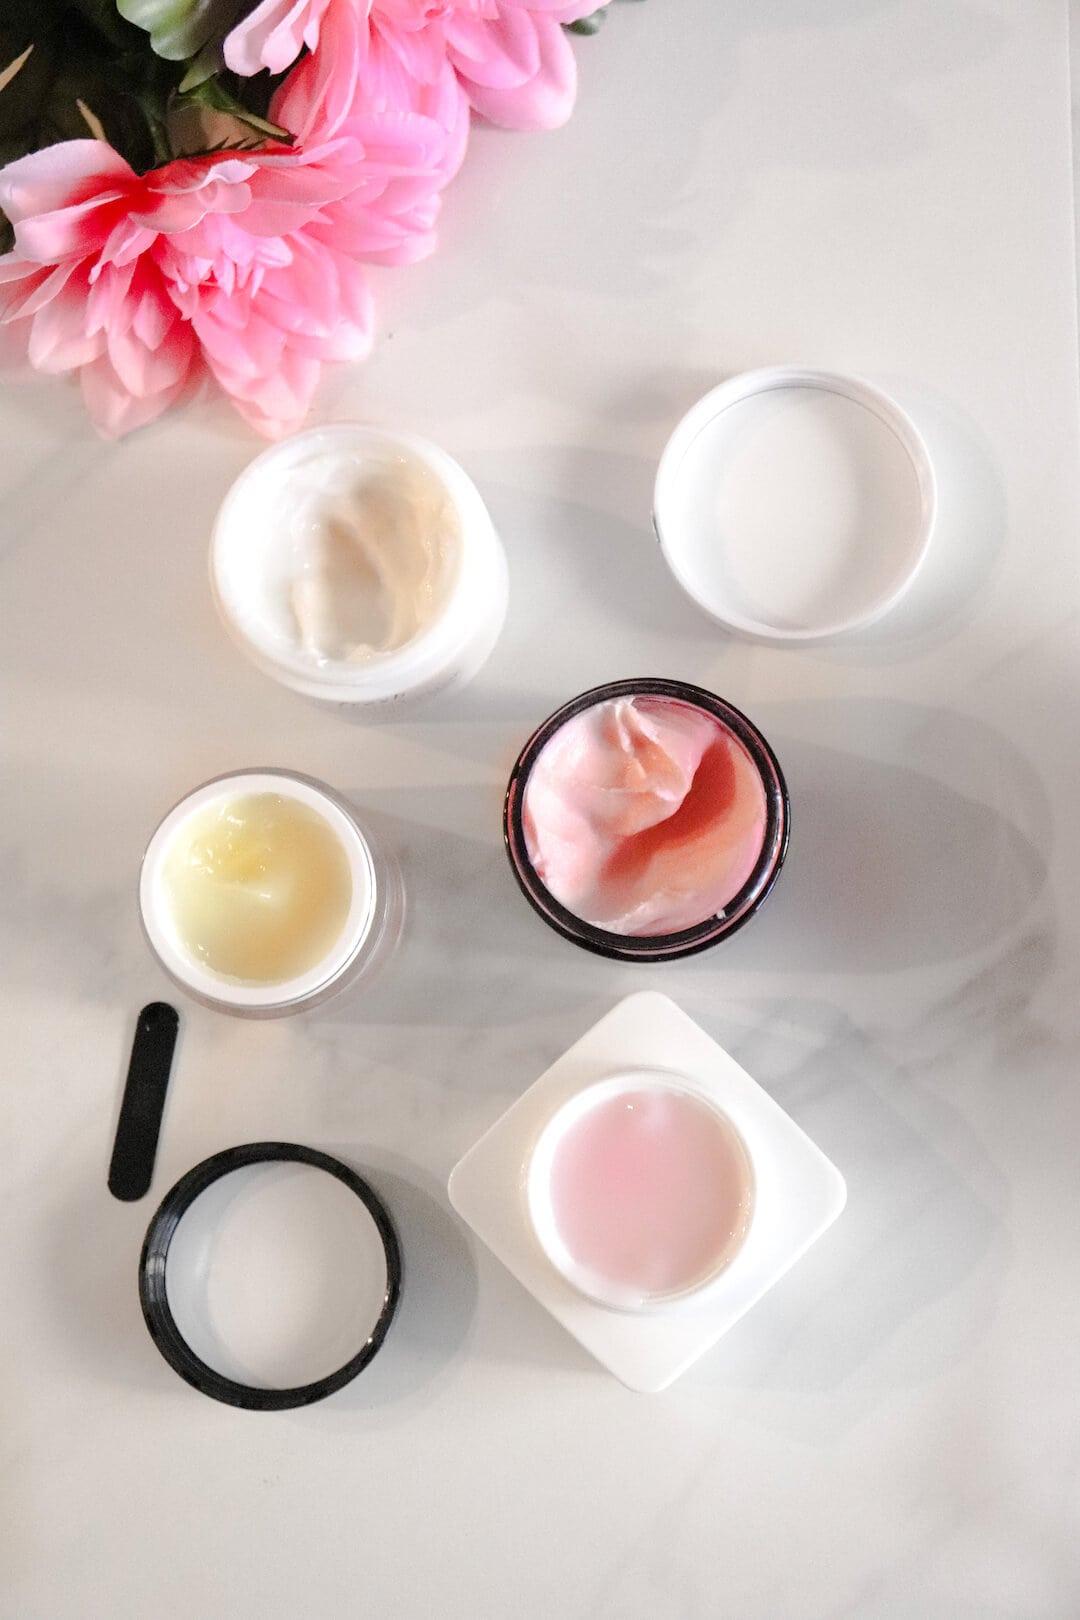 overnight skin care tips, overnight skin care products. overnight skin care routine, overnight skin care products, overnight skin care masks, overnight skin care home remedies, overnight skin care remedies